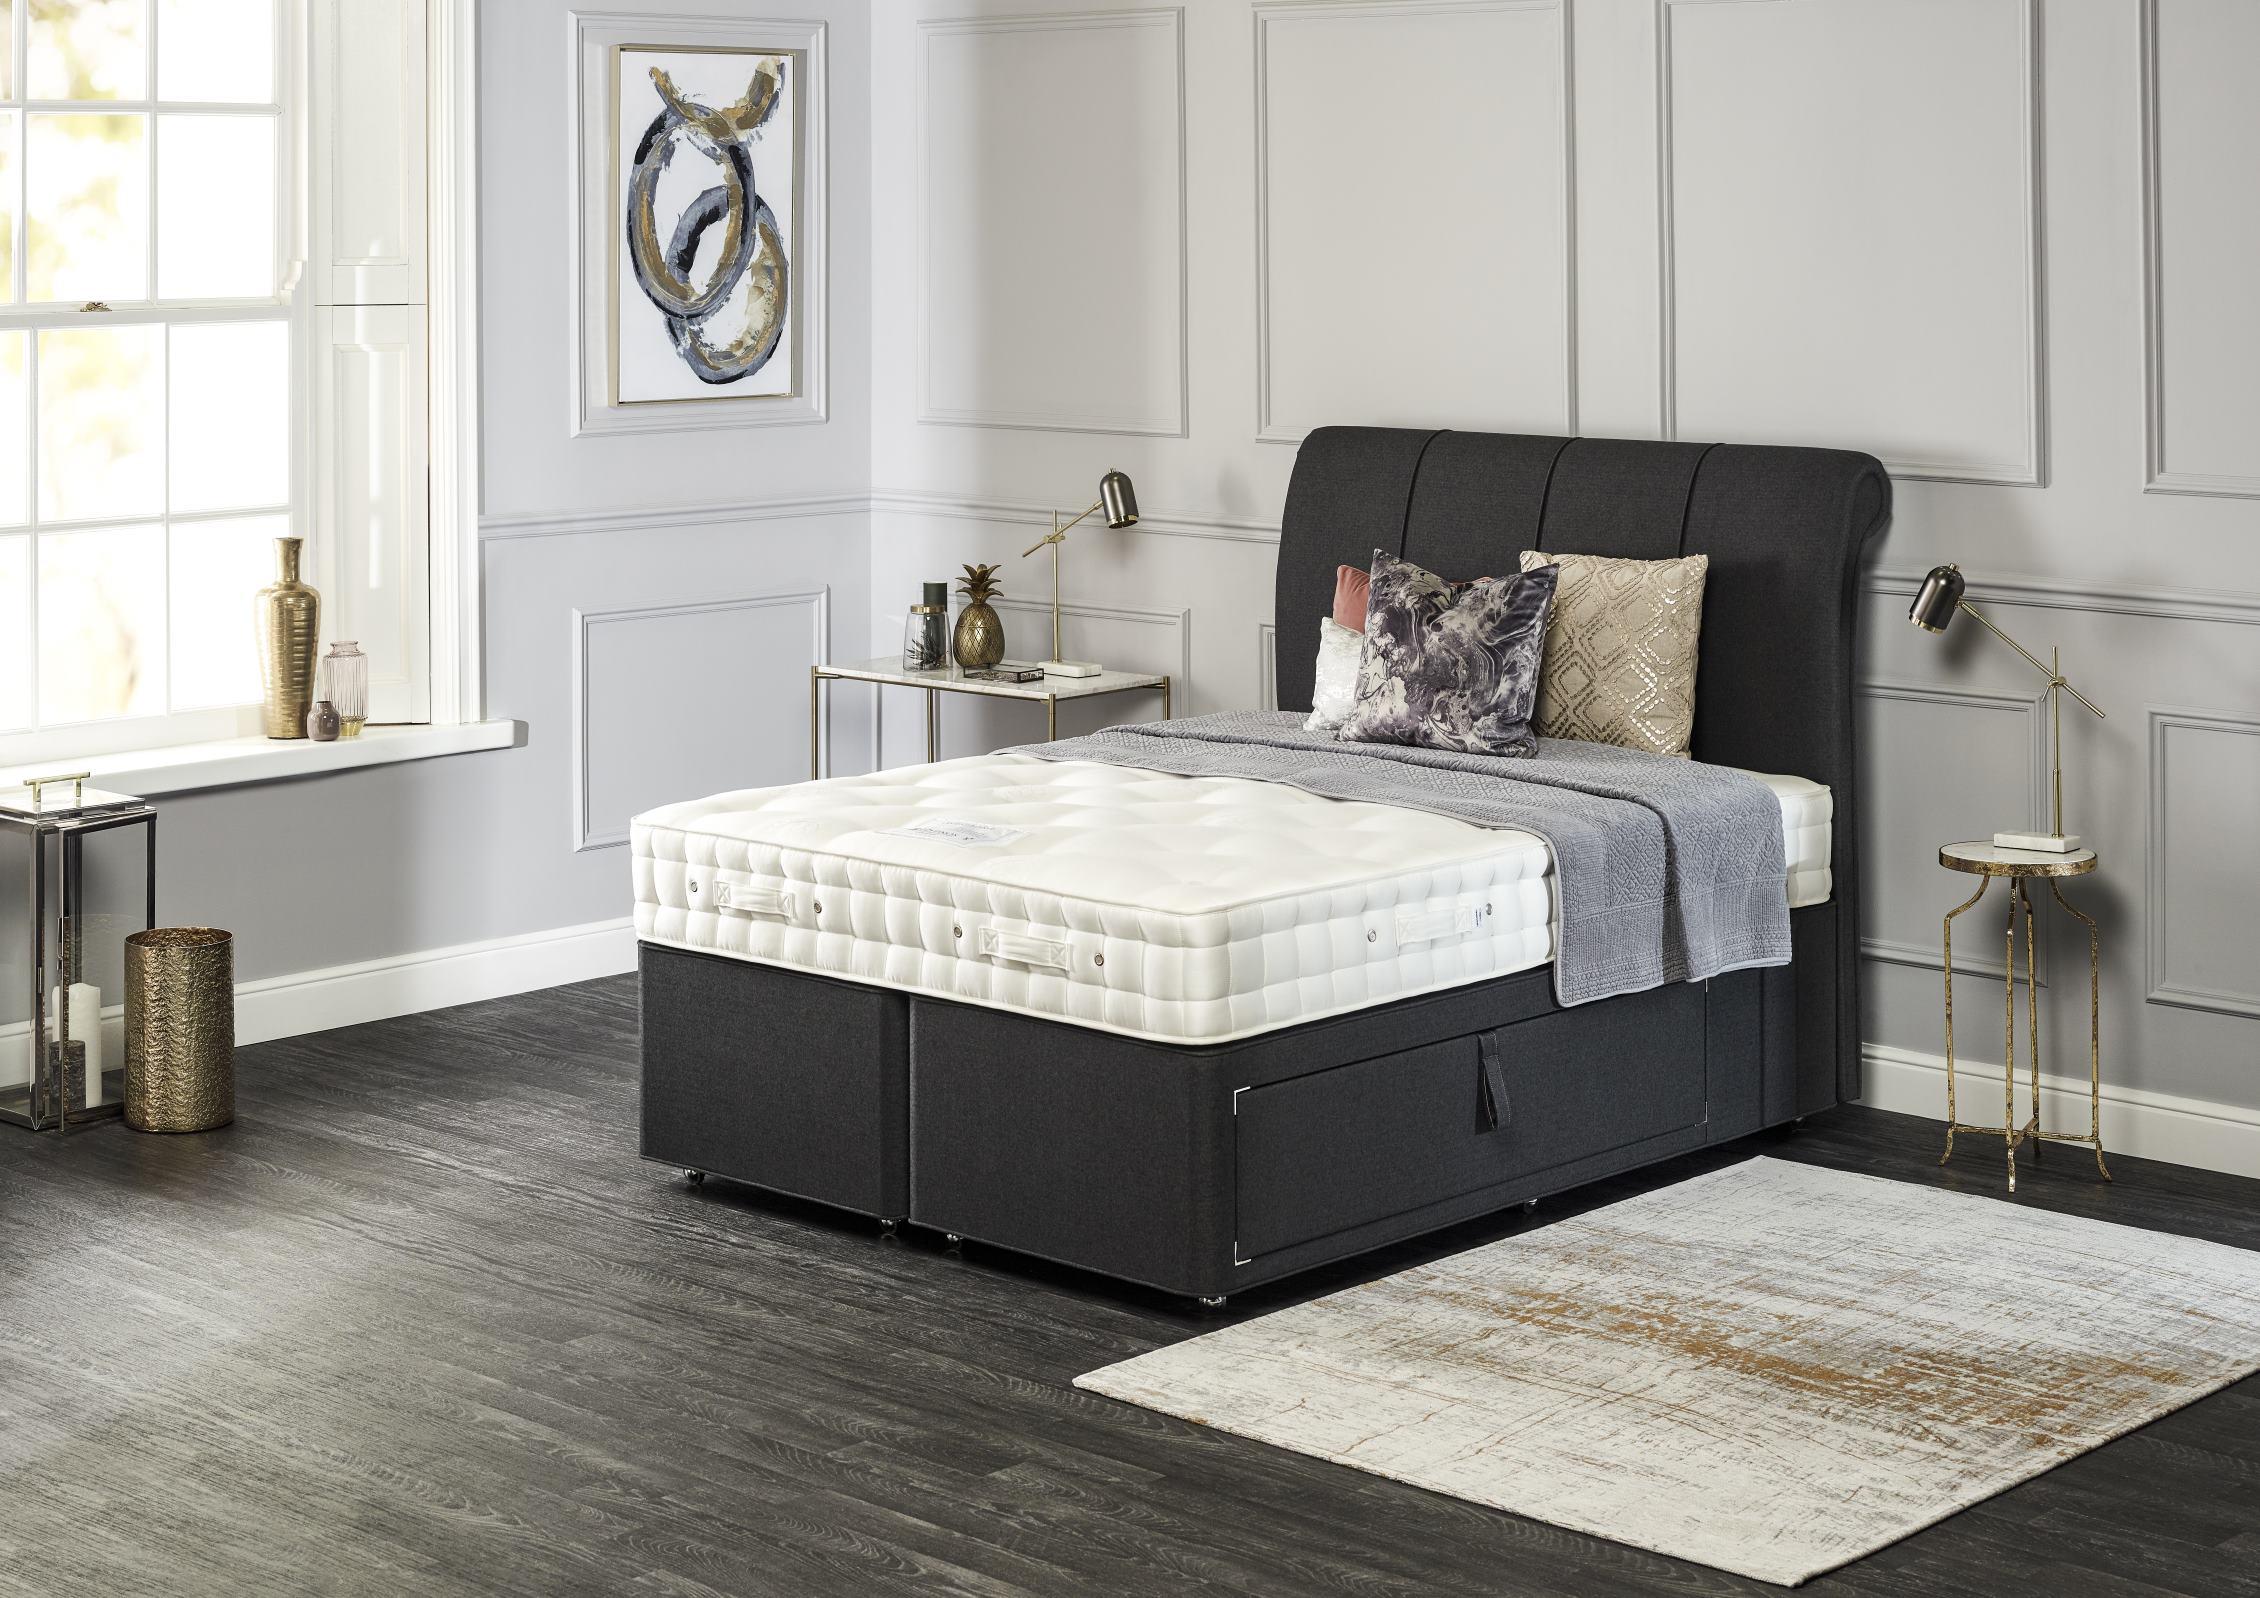 Hypnos Opulence Support Divan Bed